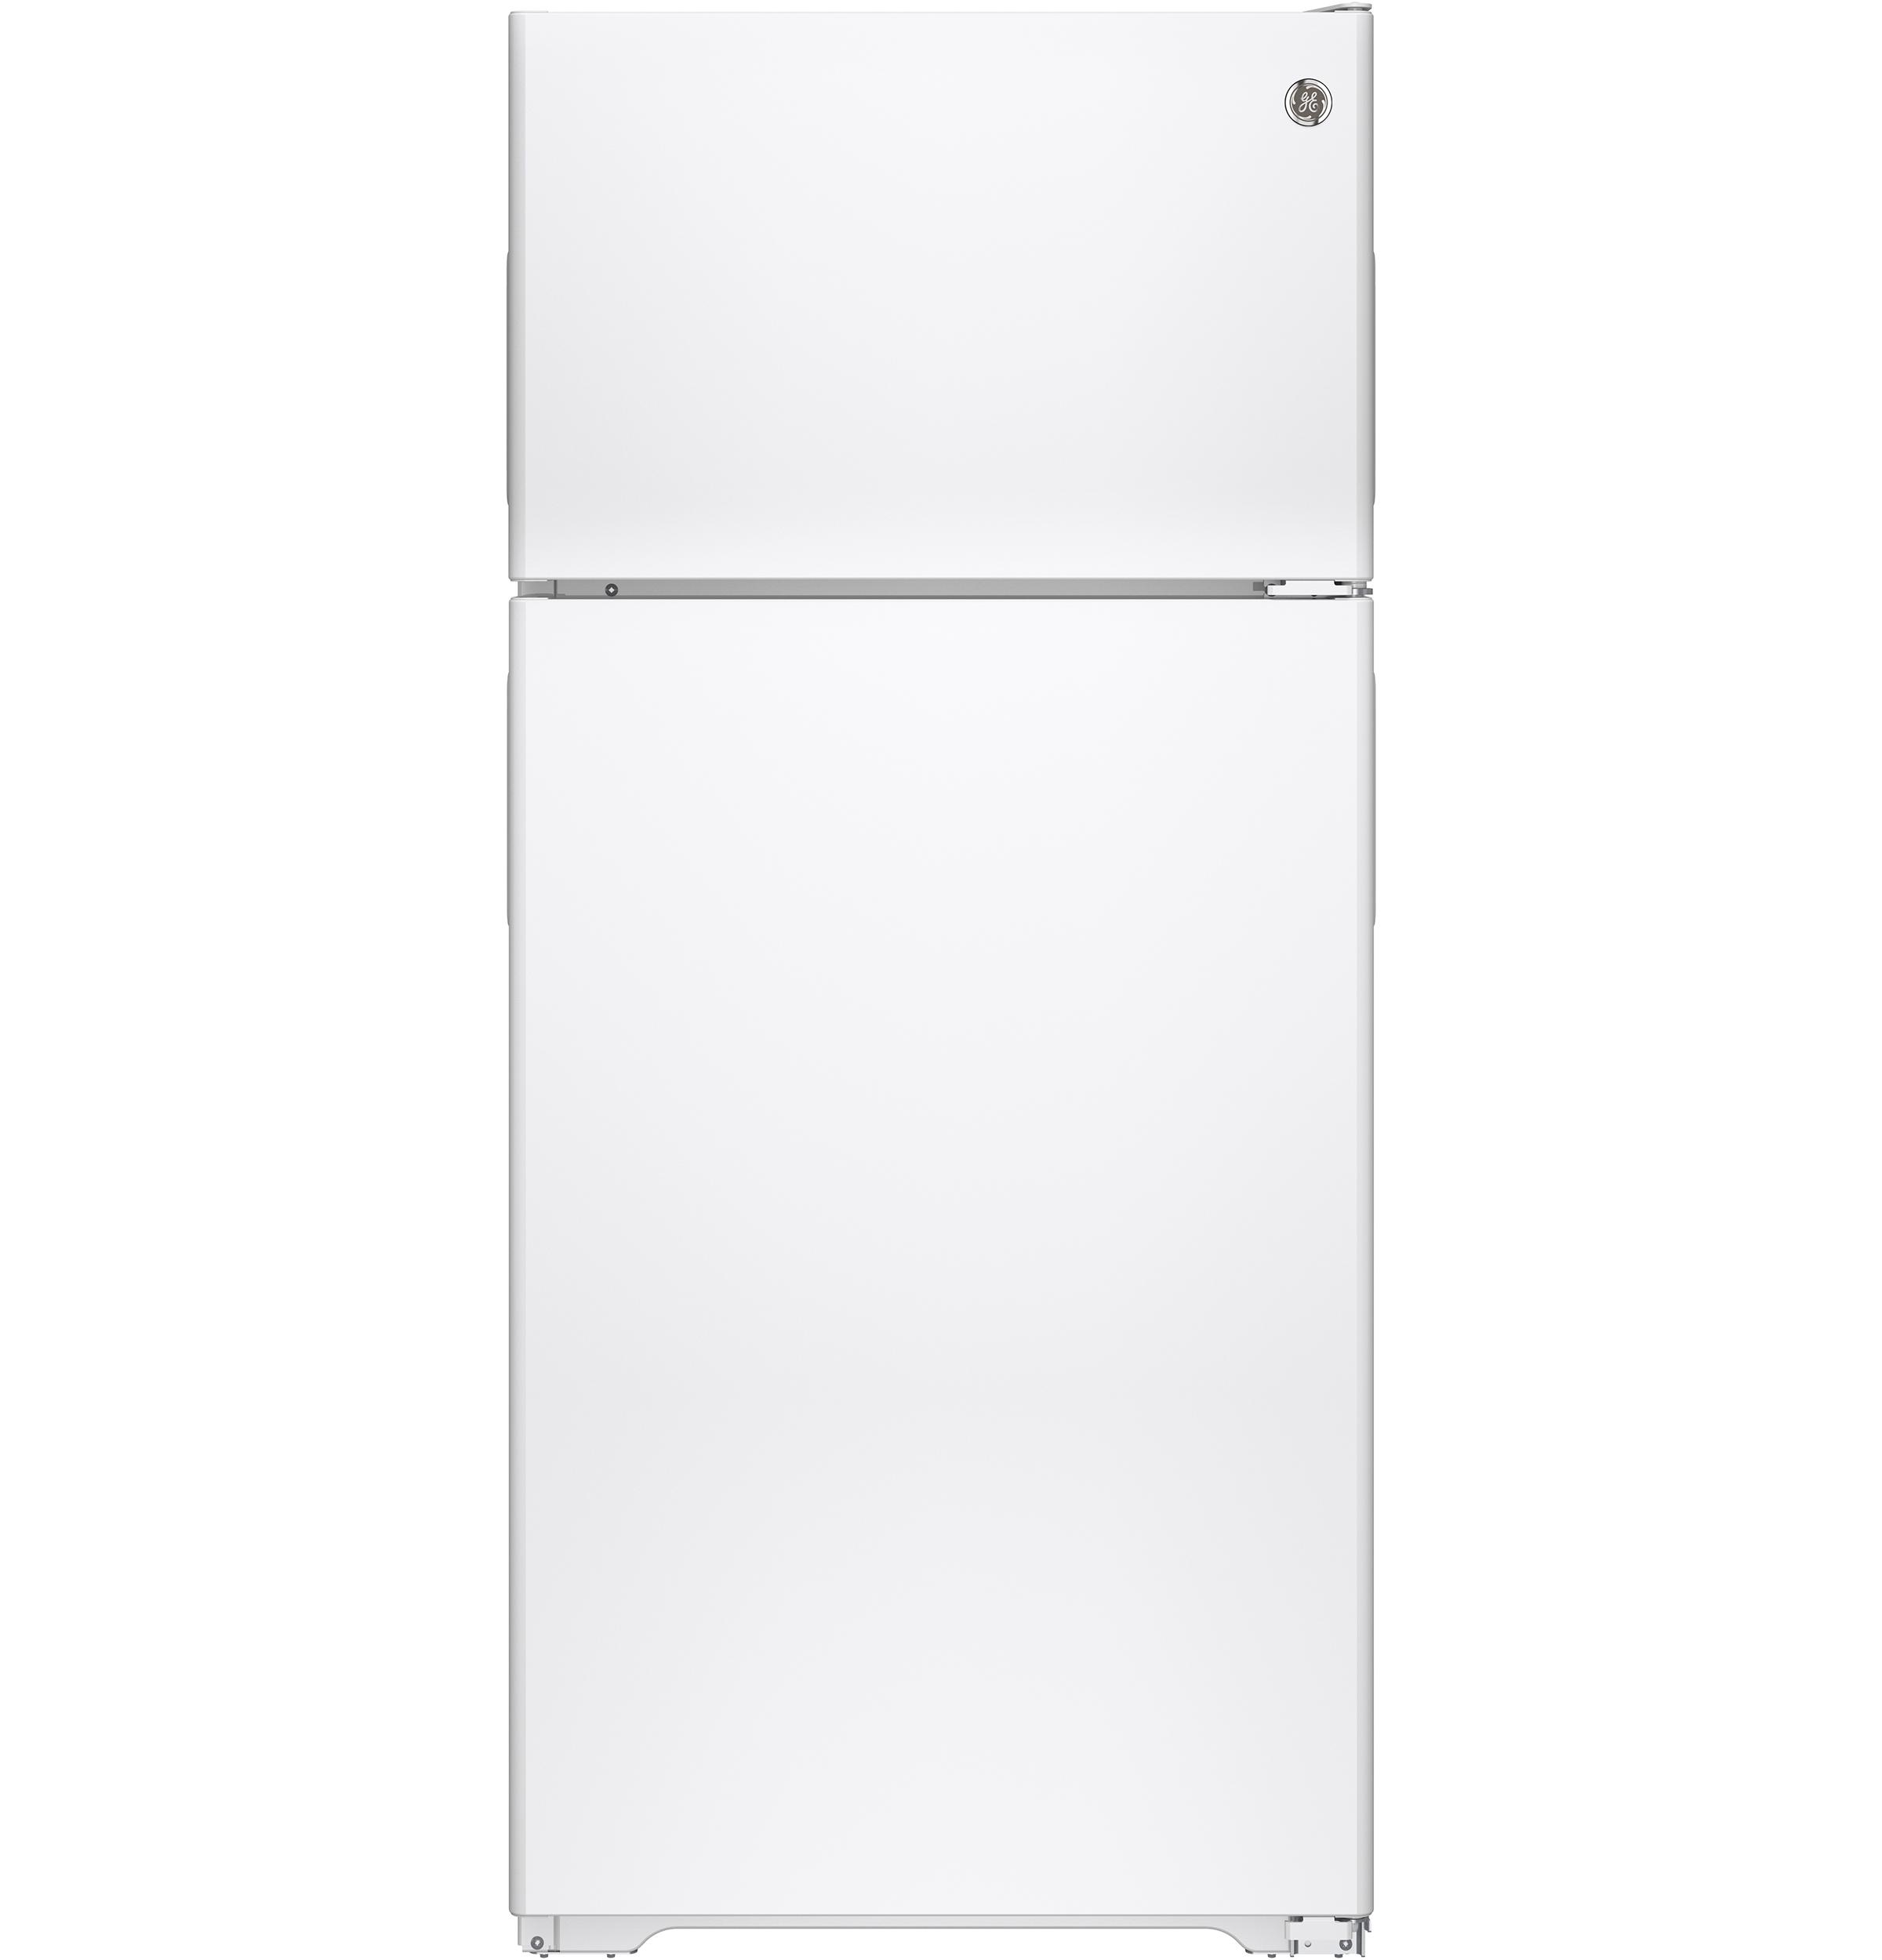 GE GE® ENERGY STAR® 15.5 Cu. Ft. Recessed Handle Top-Freezer Refrigerator